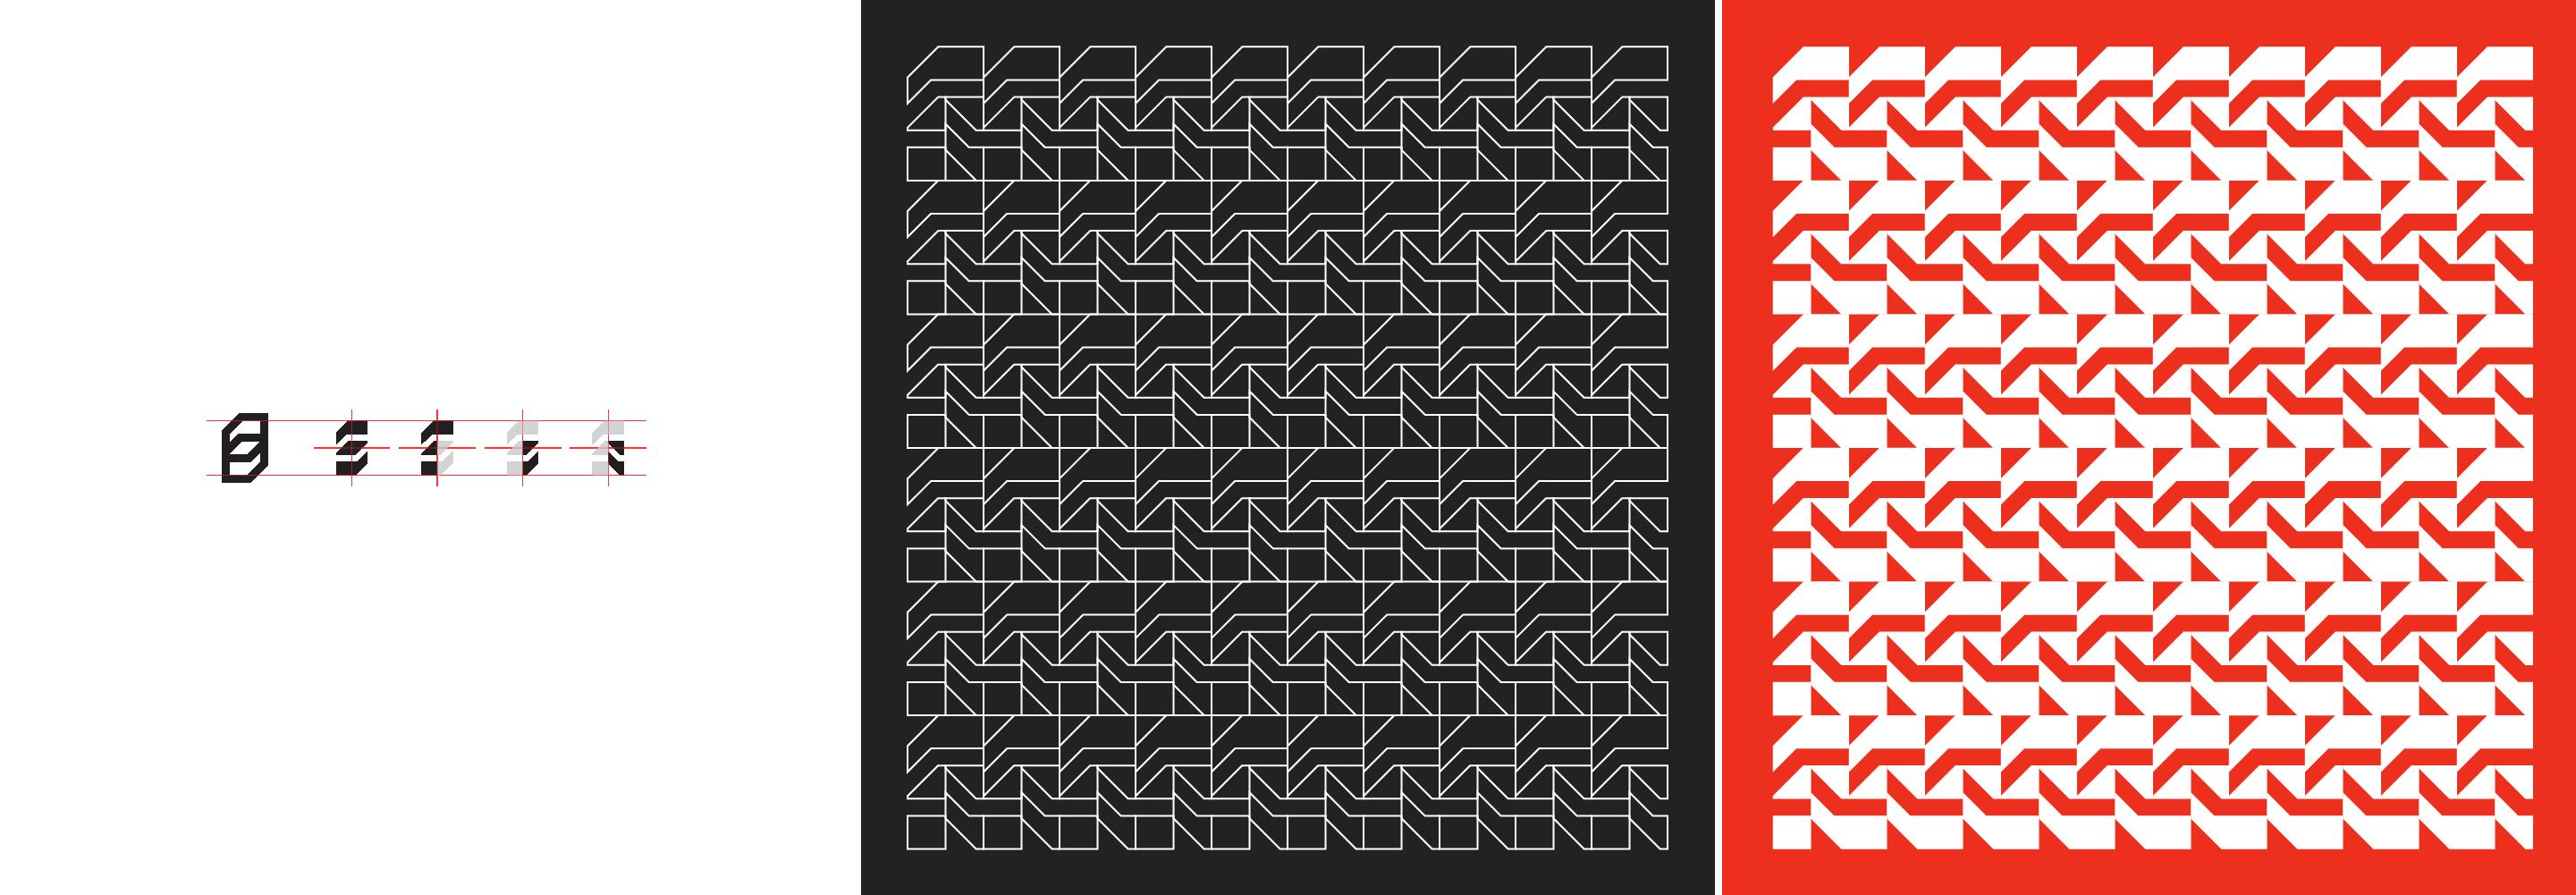 empresarial-vetores_pattern